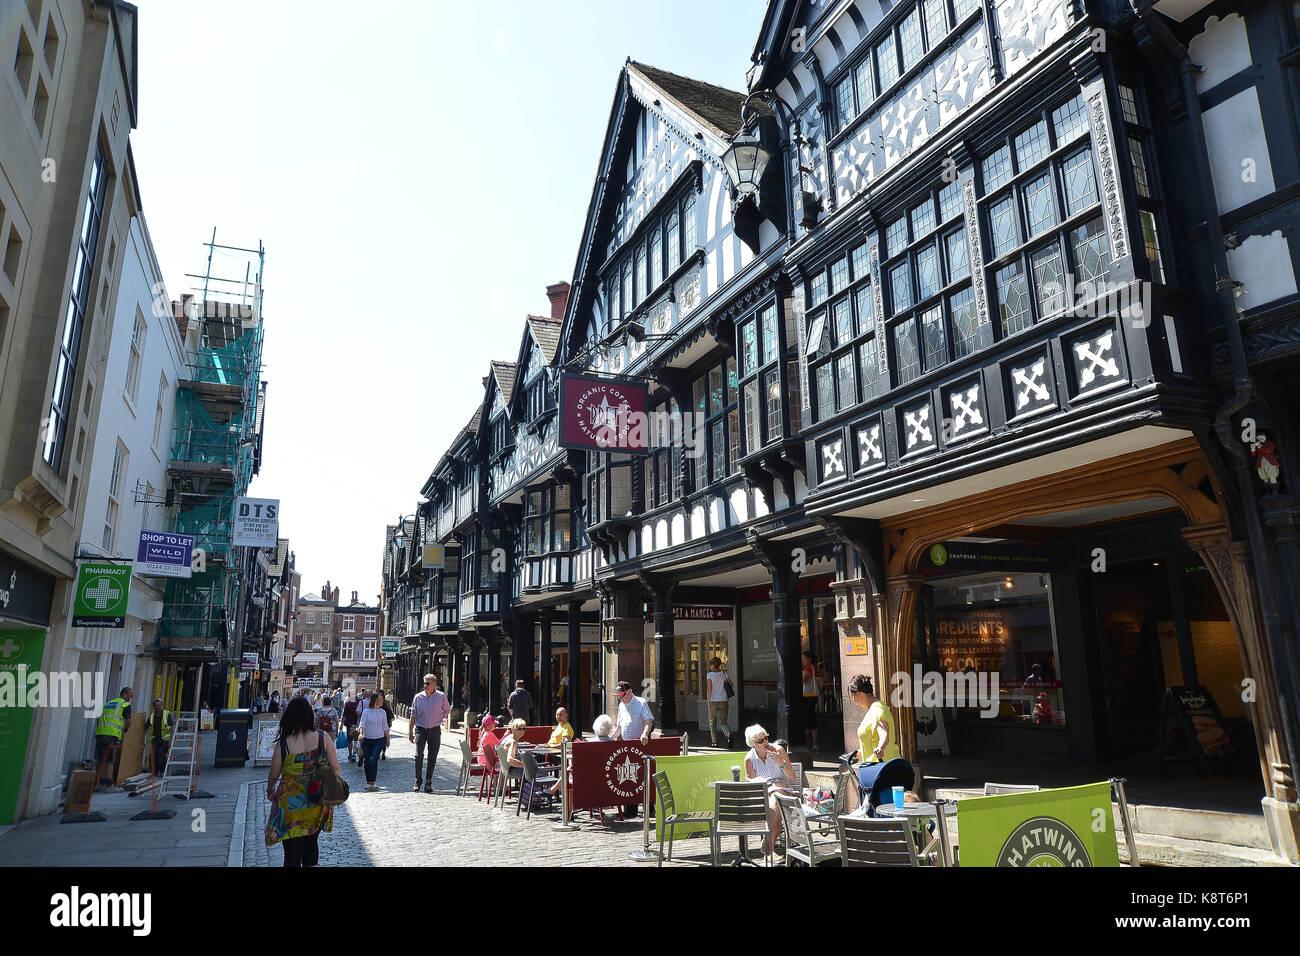 Photographs around Chester city centre - Stock Image